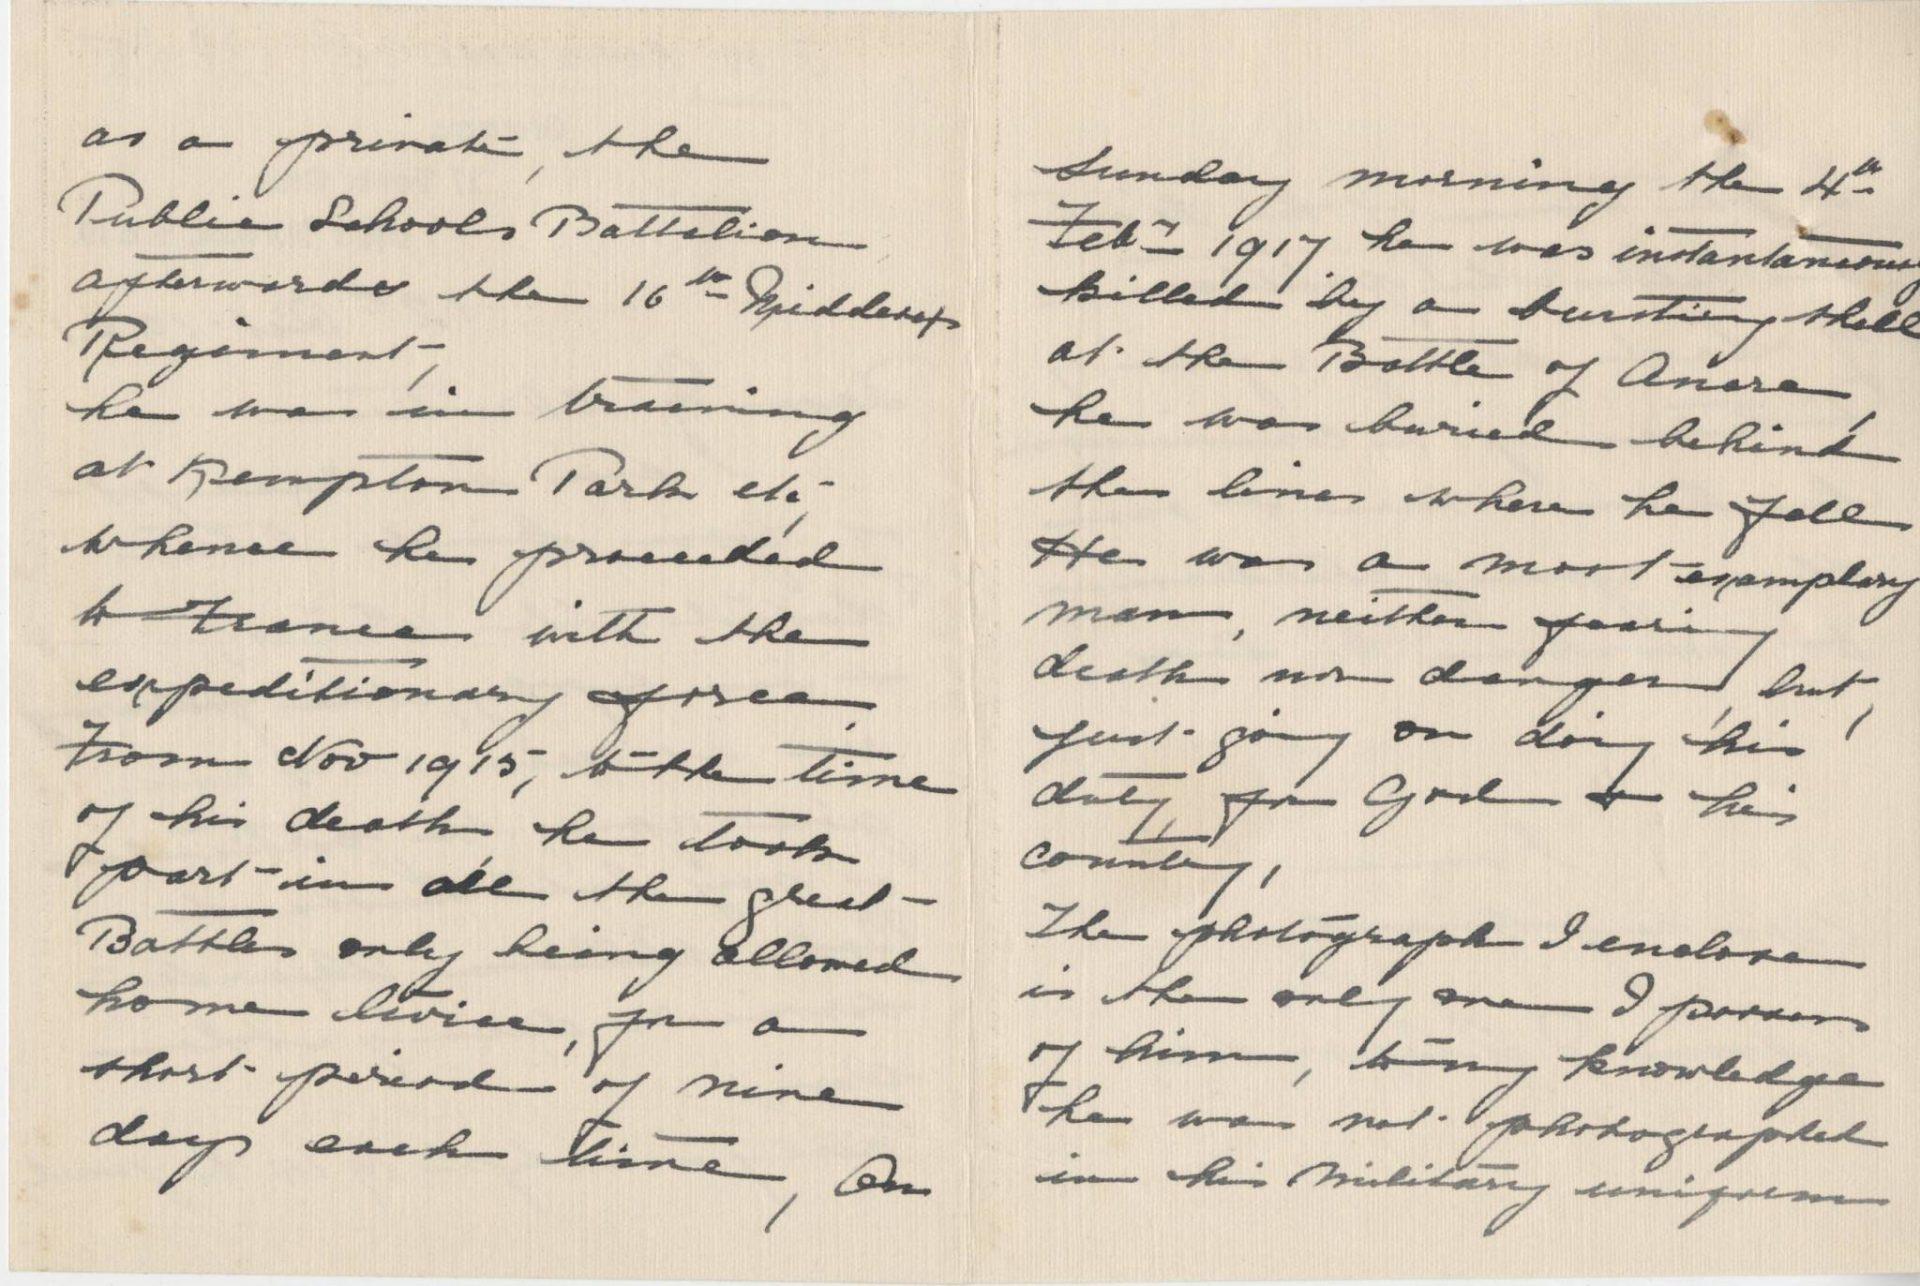 Alexandre JW Second Widow Letter 2